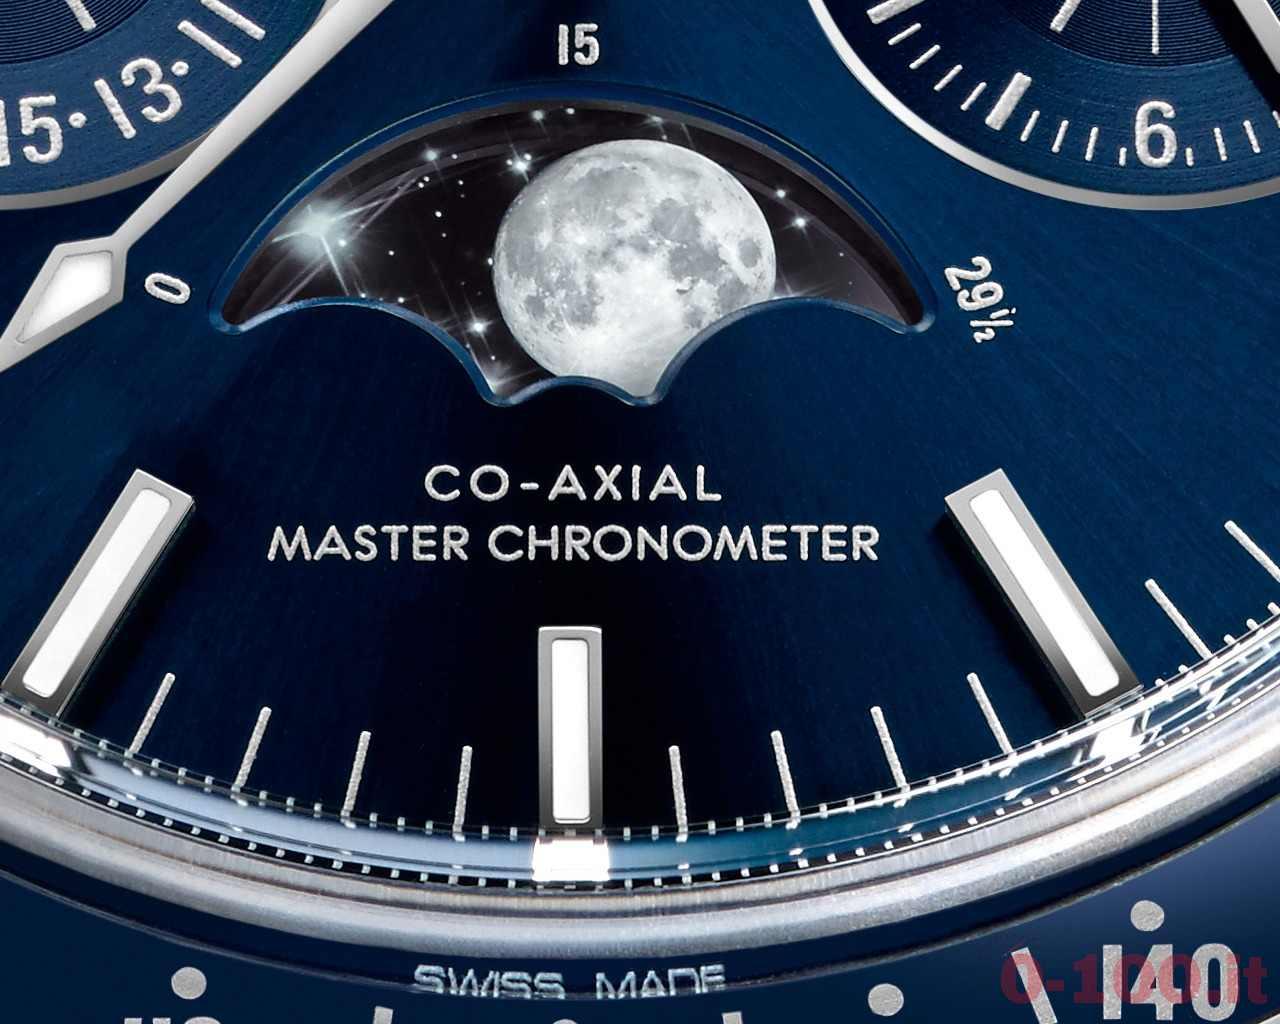 baselworld-2016-omega-speedmaster-moonphase-master-chronometer-ref-304-33-44-52-03-001_0-1003